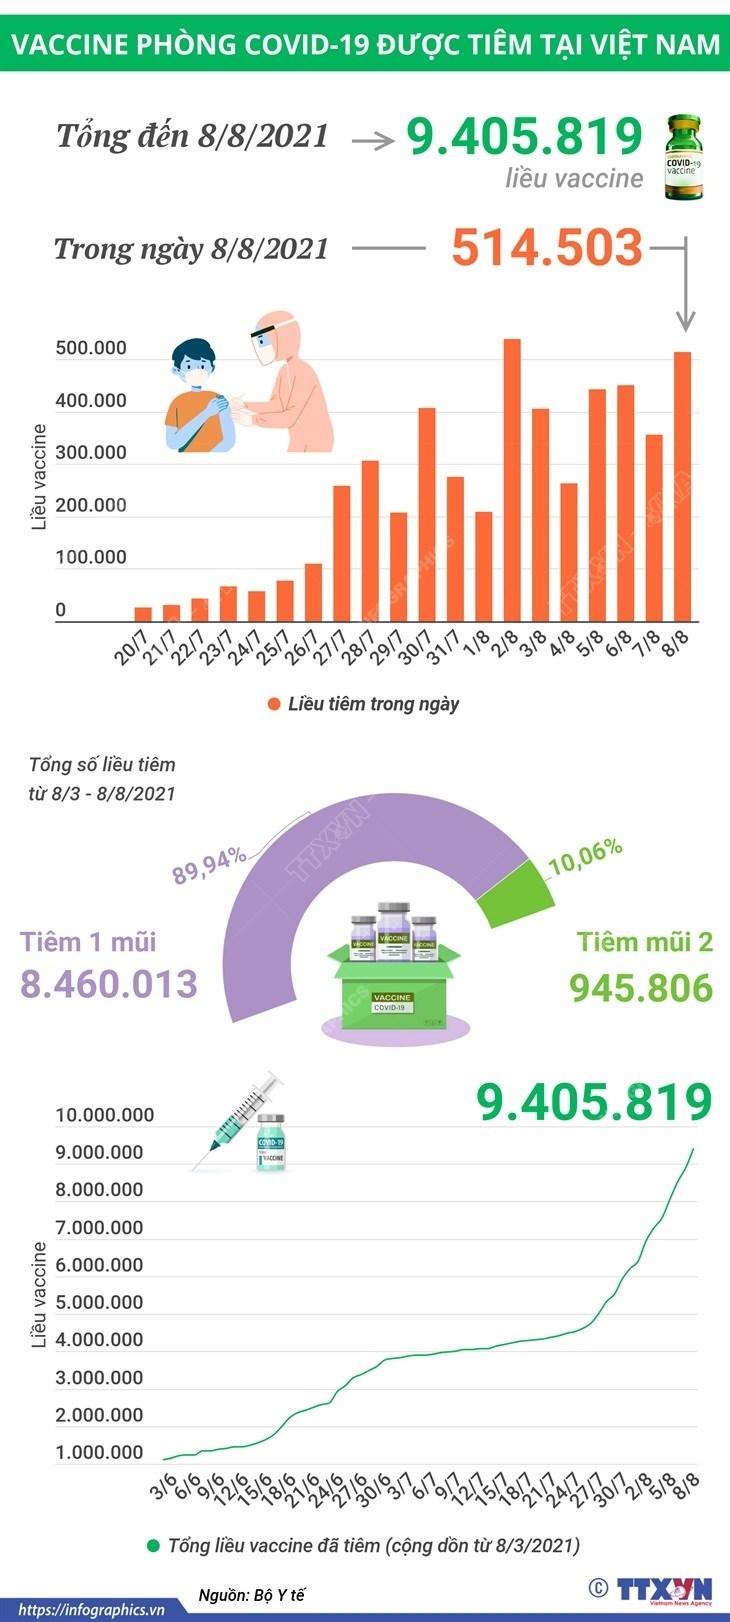 Hon 9,4 trieu lieu vaccine phong COVID-19 da duoc tiem tai Viet Nam hinh anh 1